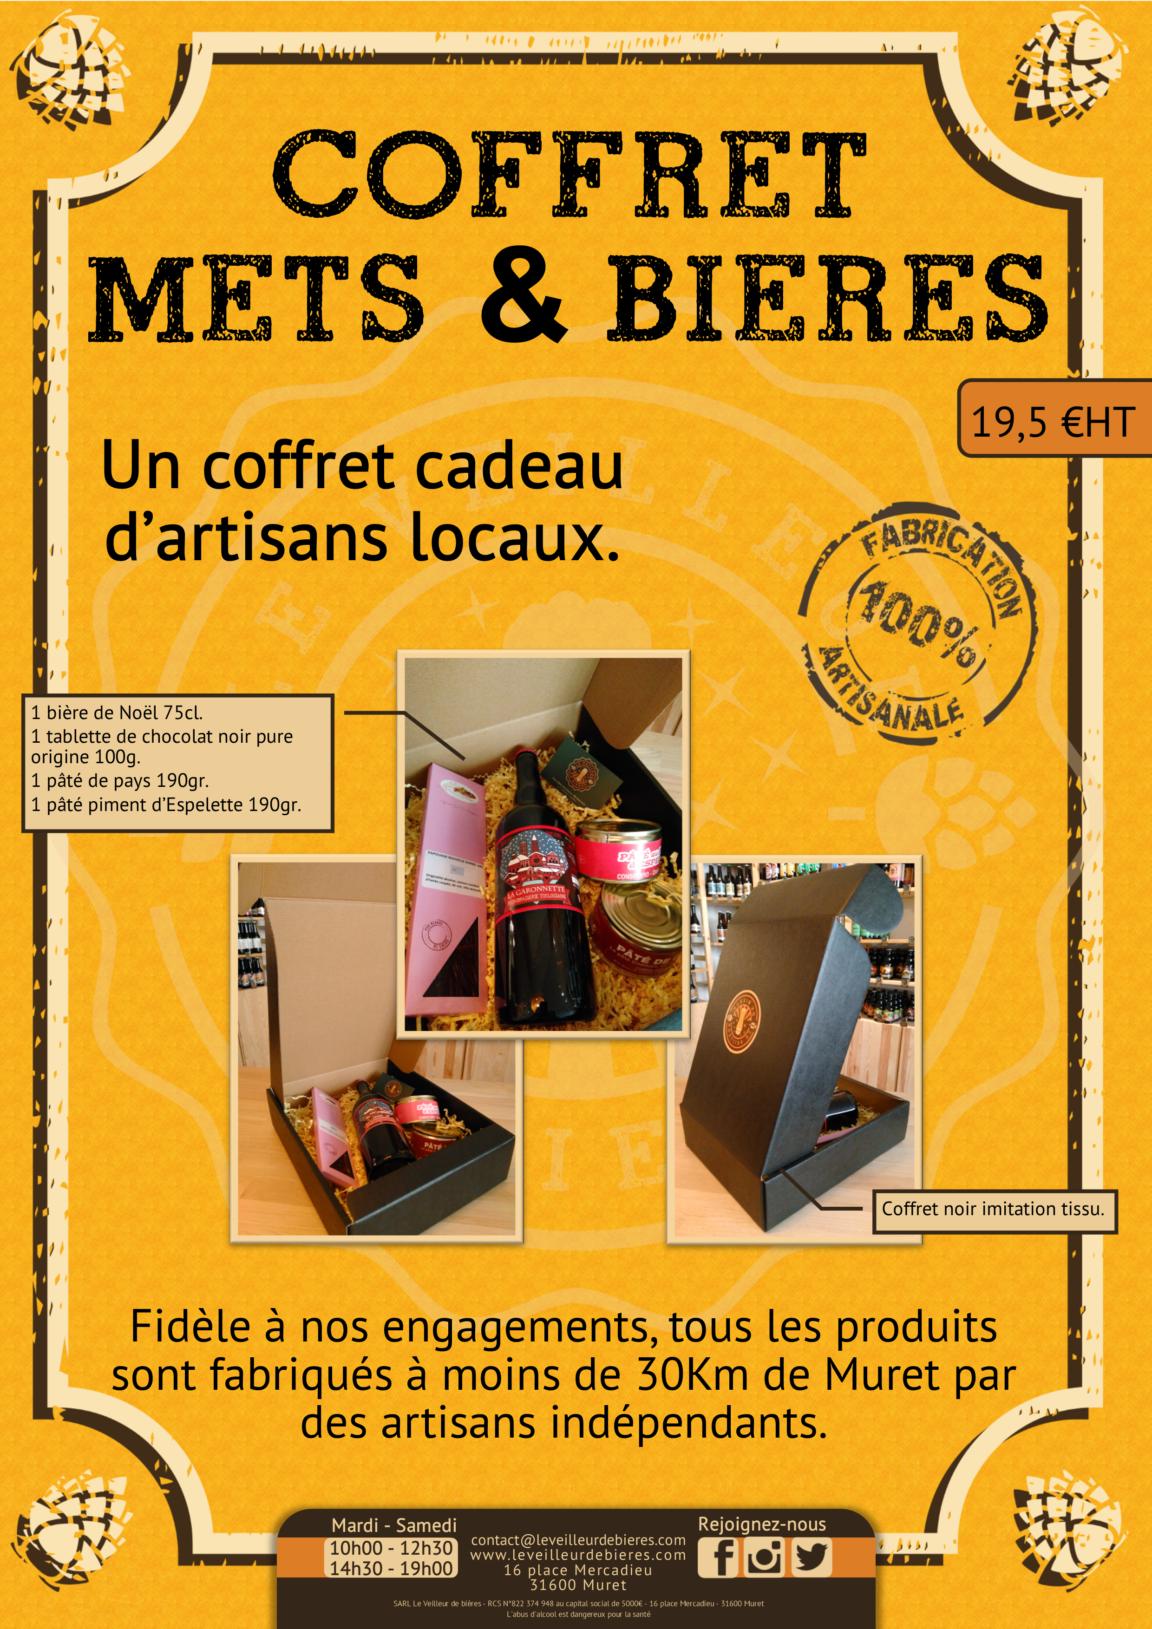 COFFRET BIERES METS